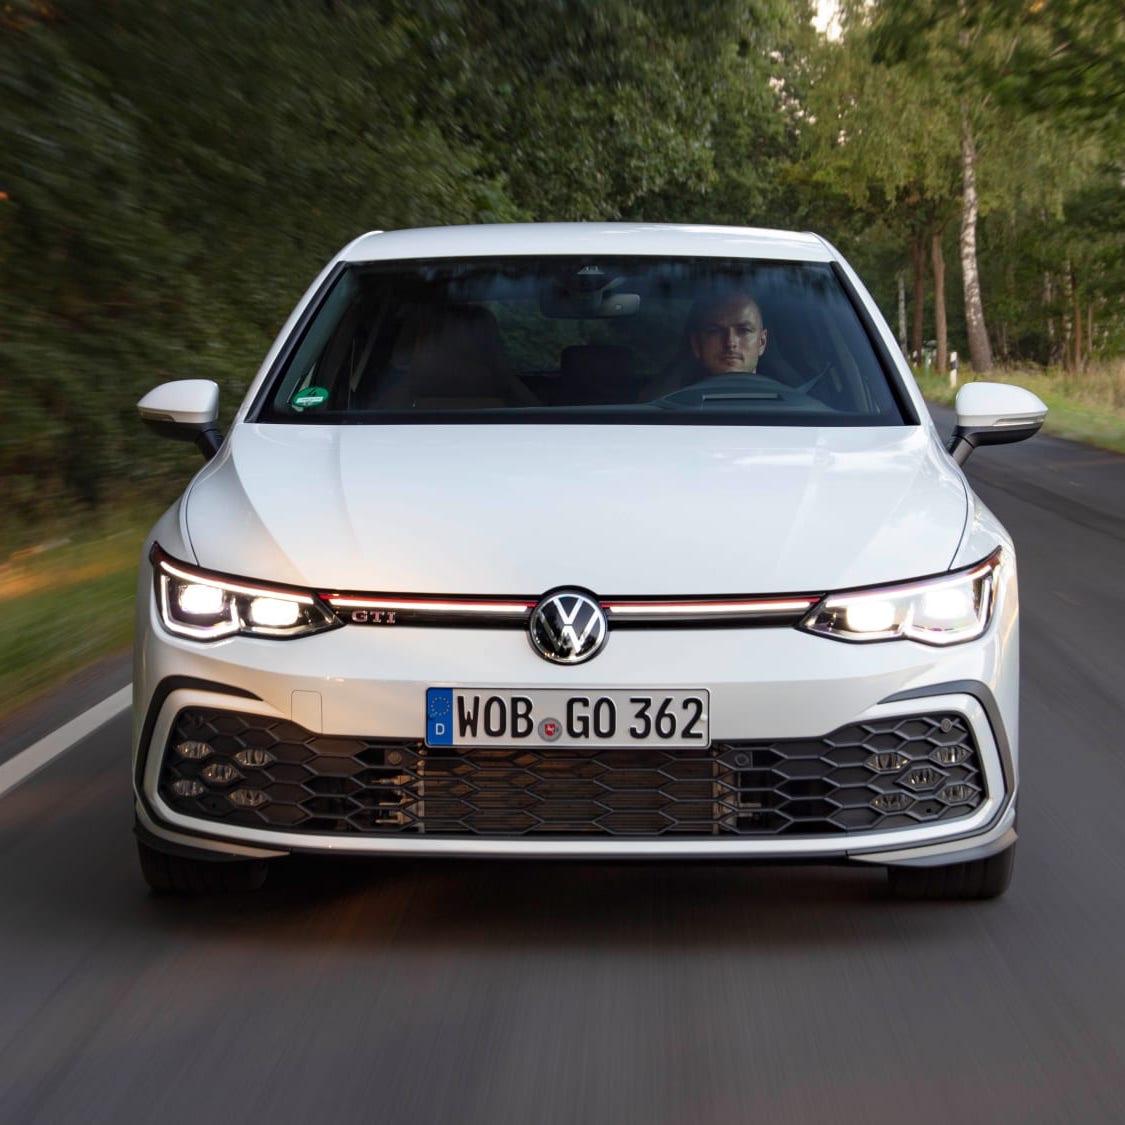 [Gewerbeleasing] VW Golf GTI (245 PS) mtl. 159€ + 799€ ÜF (eff. mtl. 192,29€), LF 0,49, GF 0,59, 24 Monate, konfigurierbar